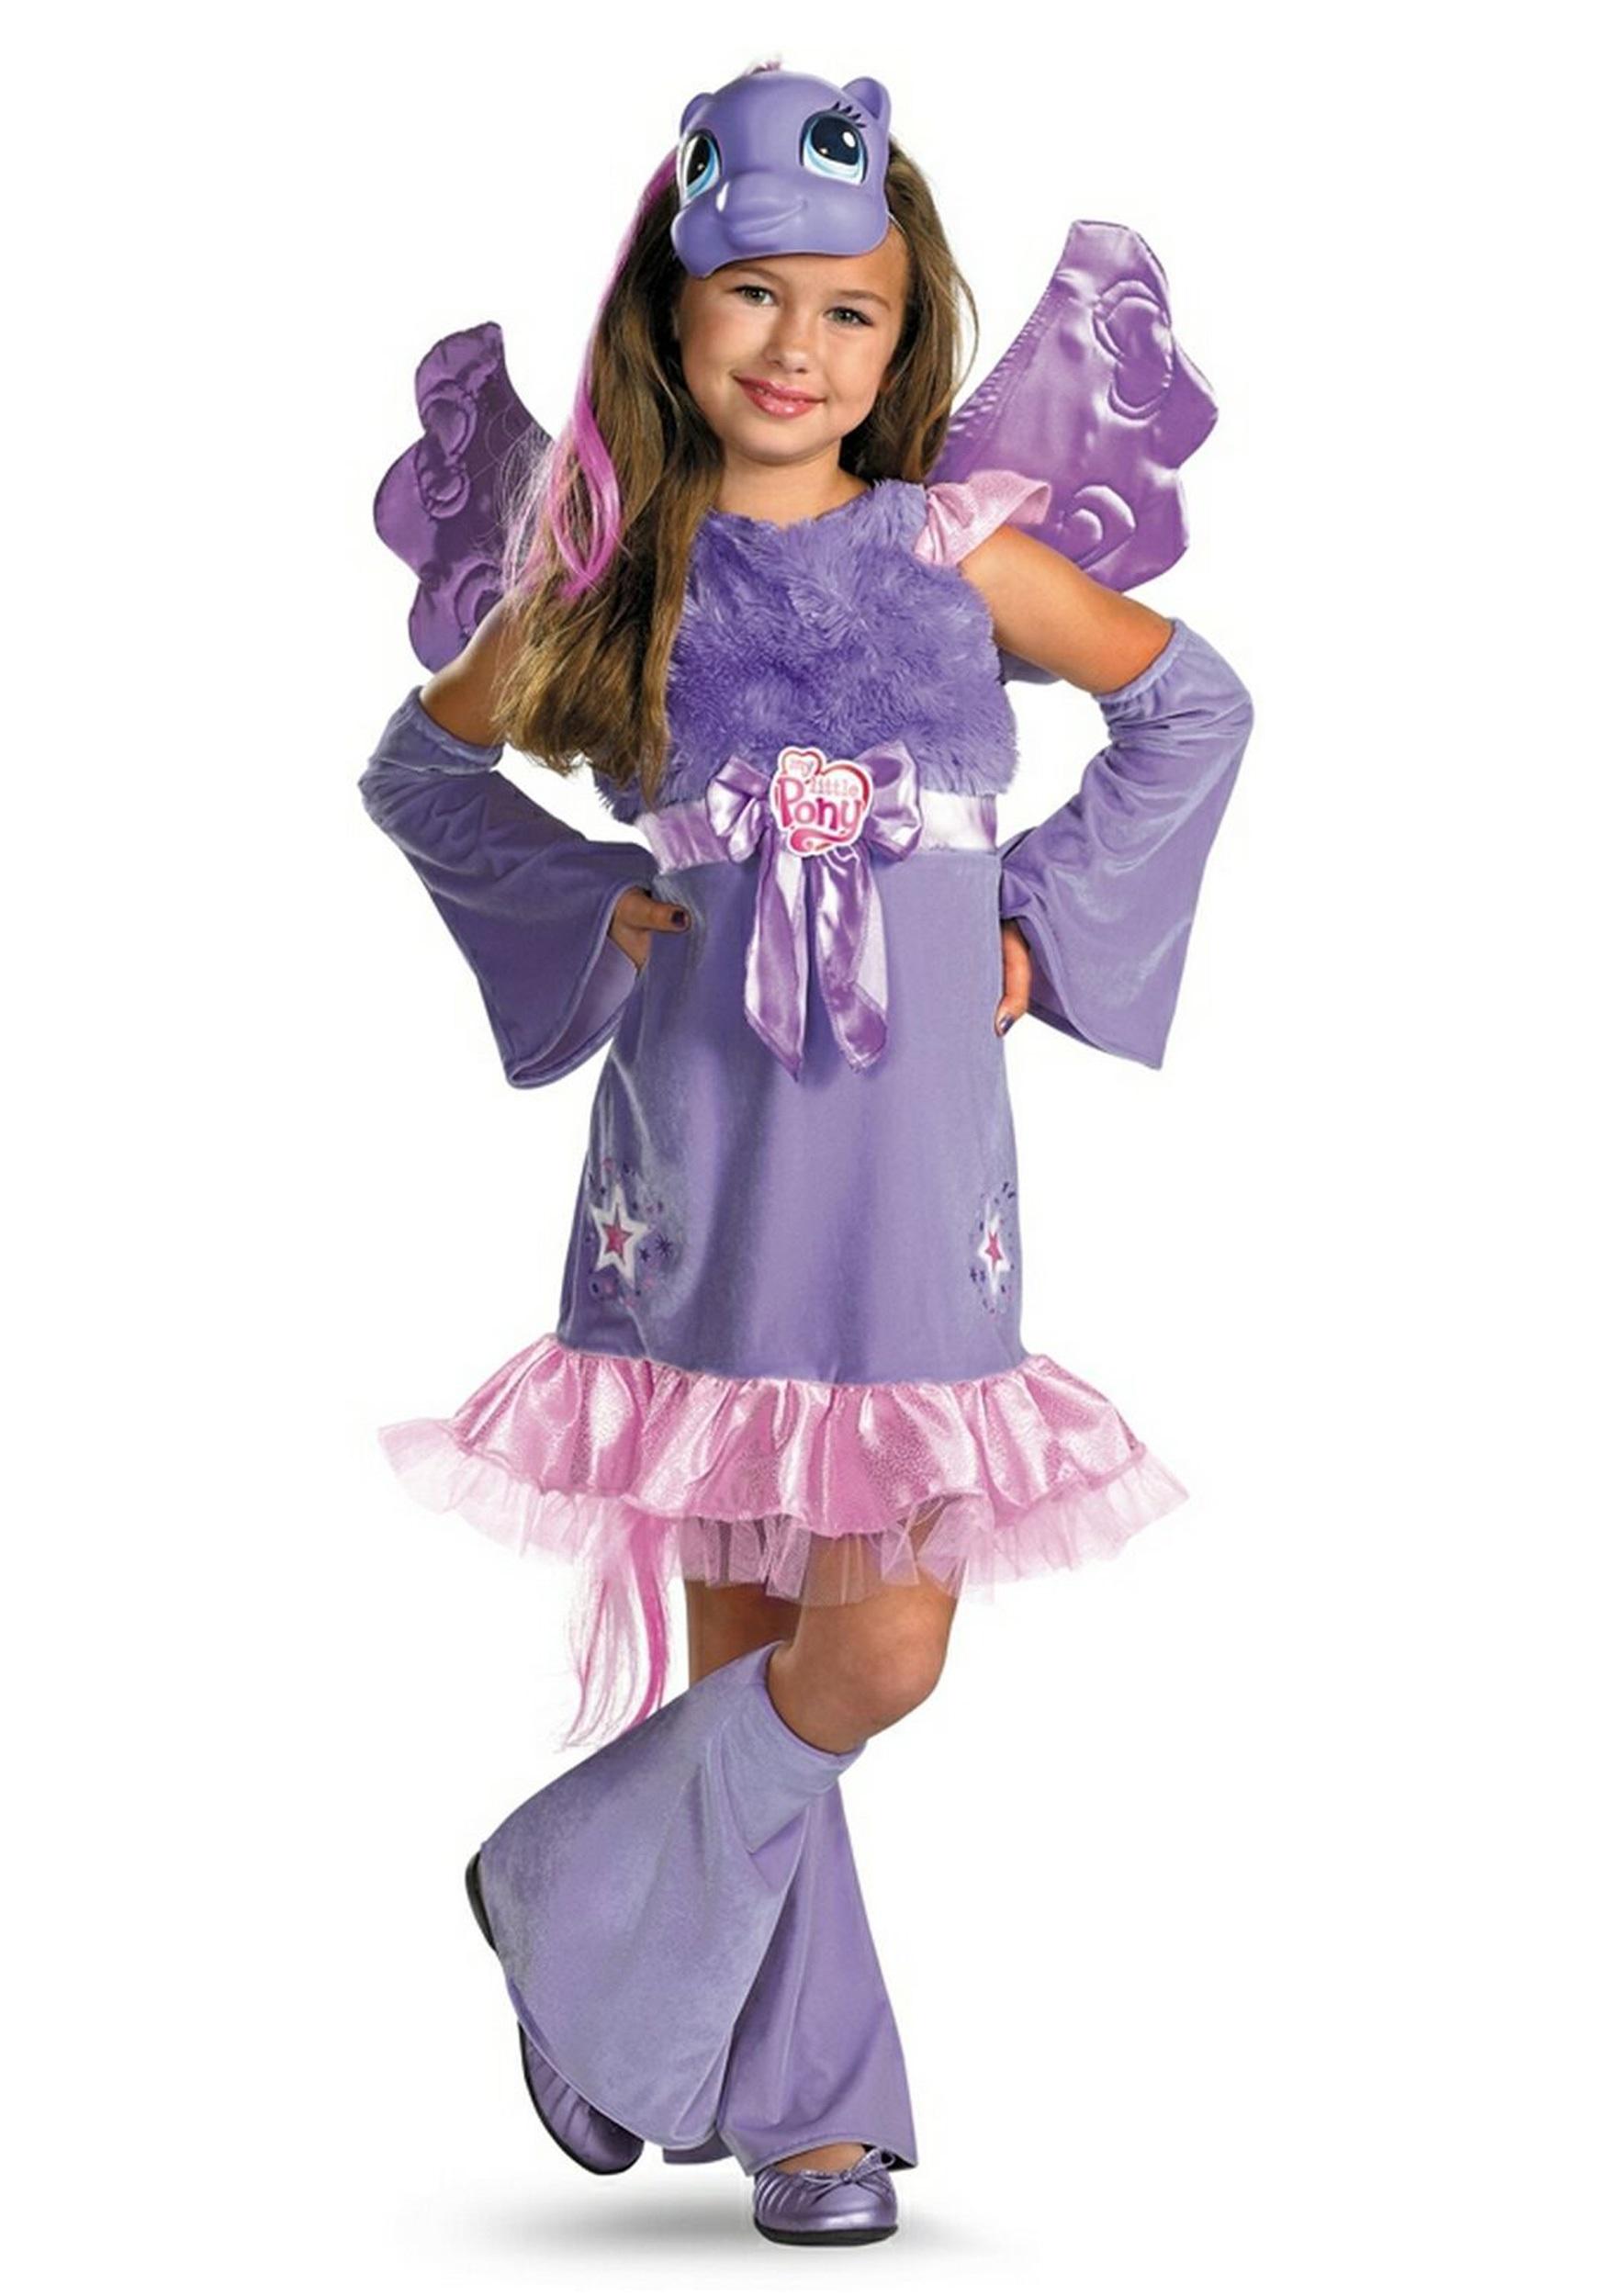 Girls My Little Pony Costume  sc 1 st  Halloween Costumes & Girls My Little Pony Costume - Halloween Costumes